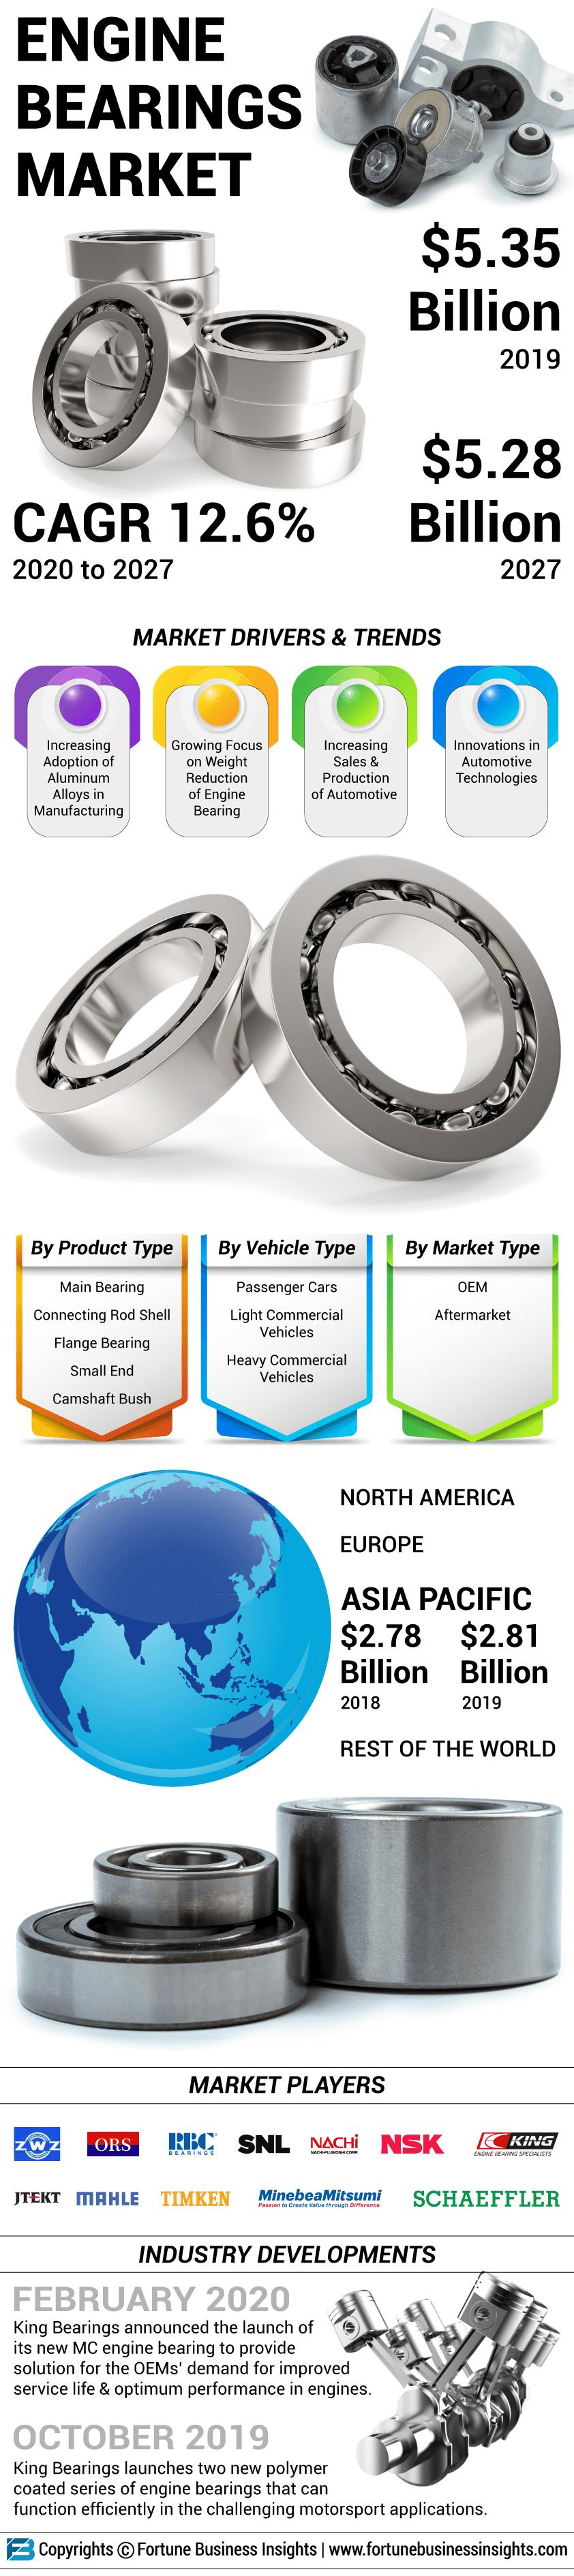 Engine Bearings Market